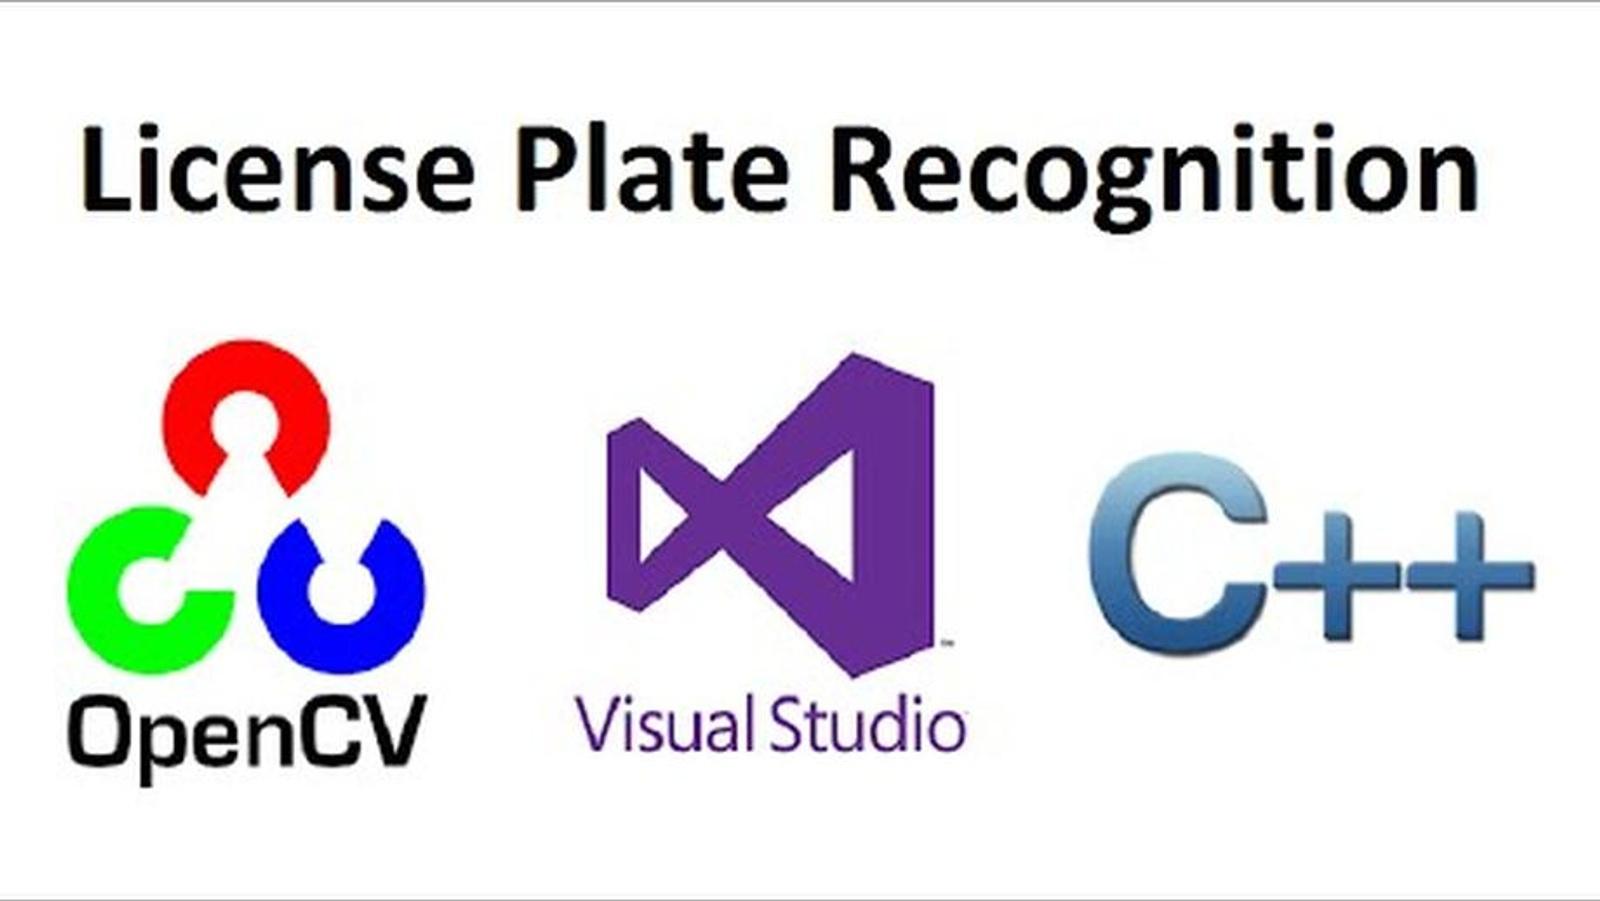 License Plate Recognition Opencv - wifihill